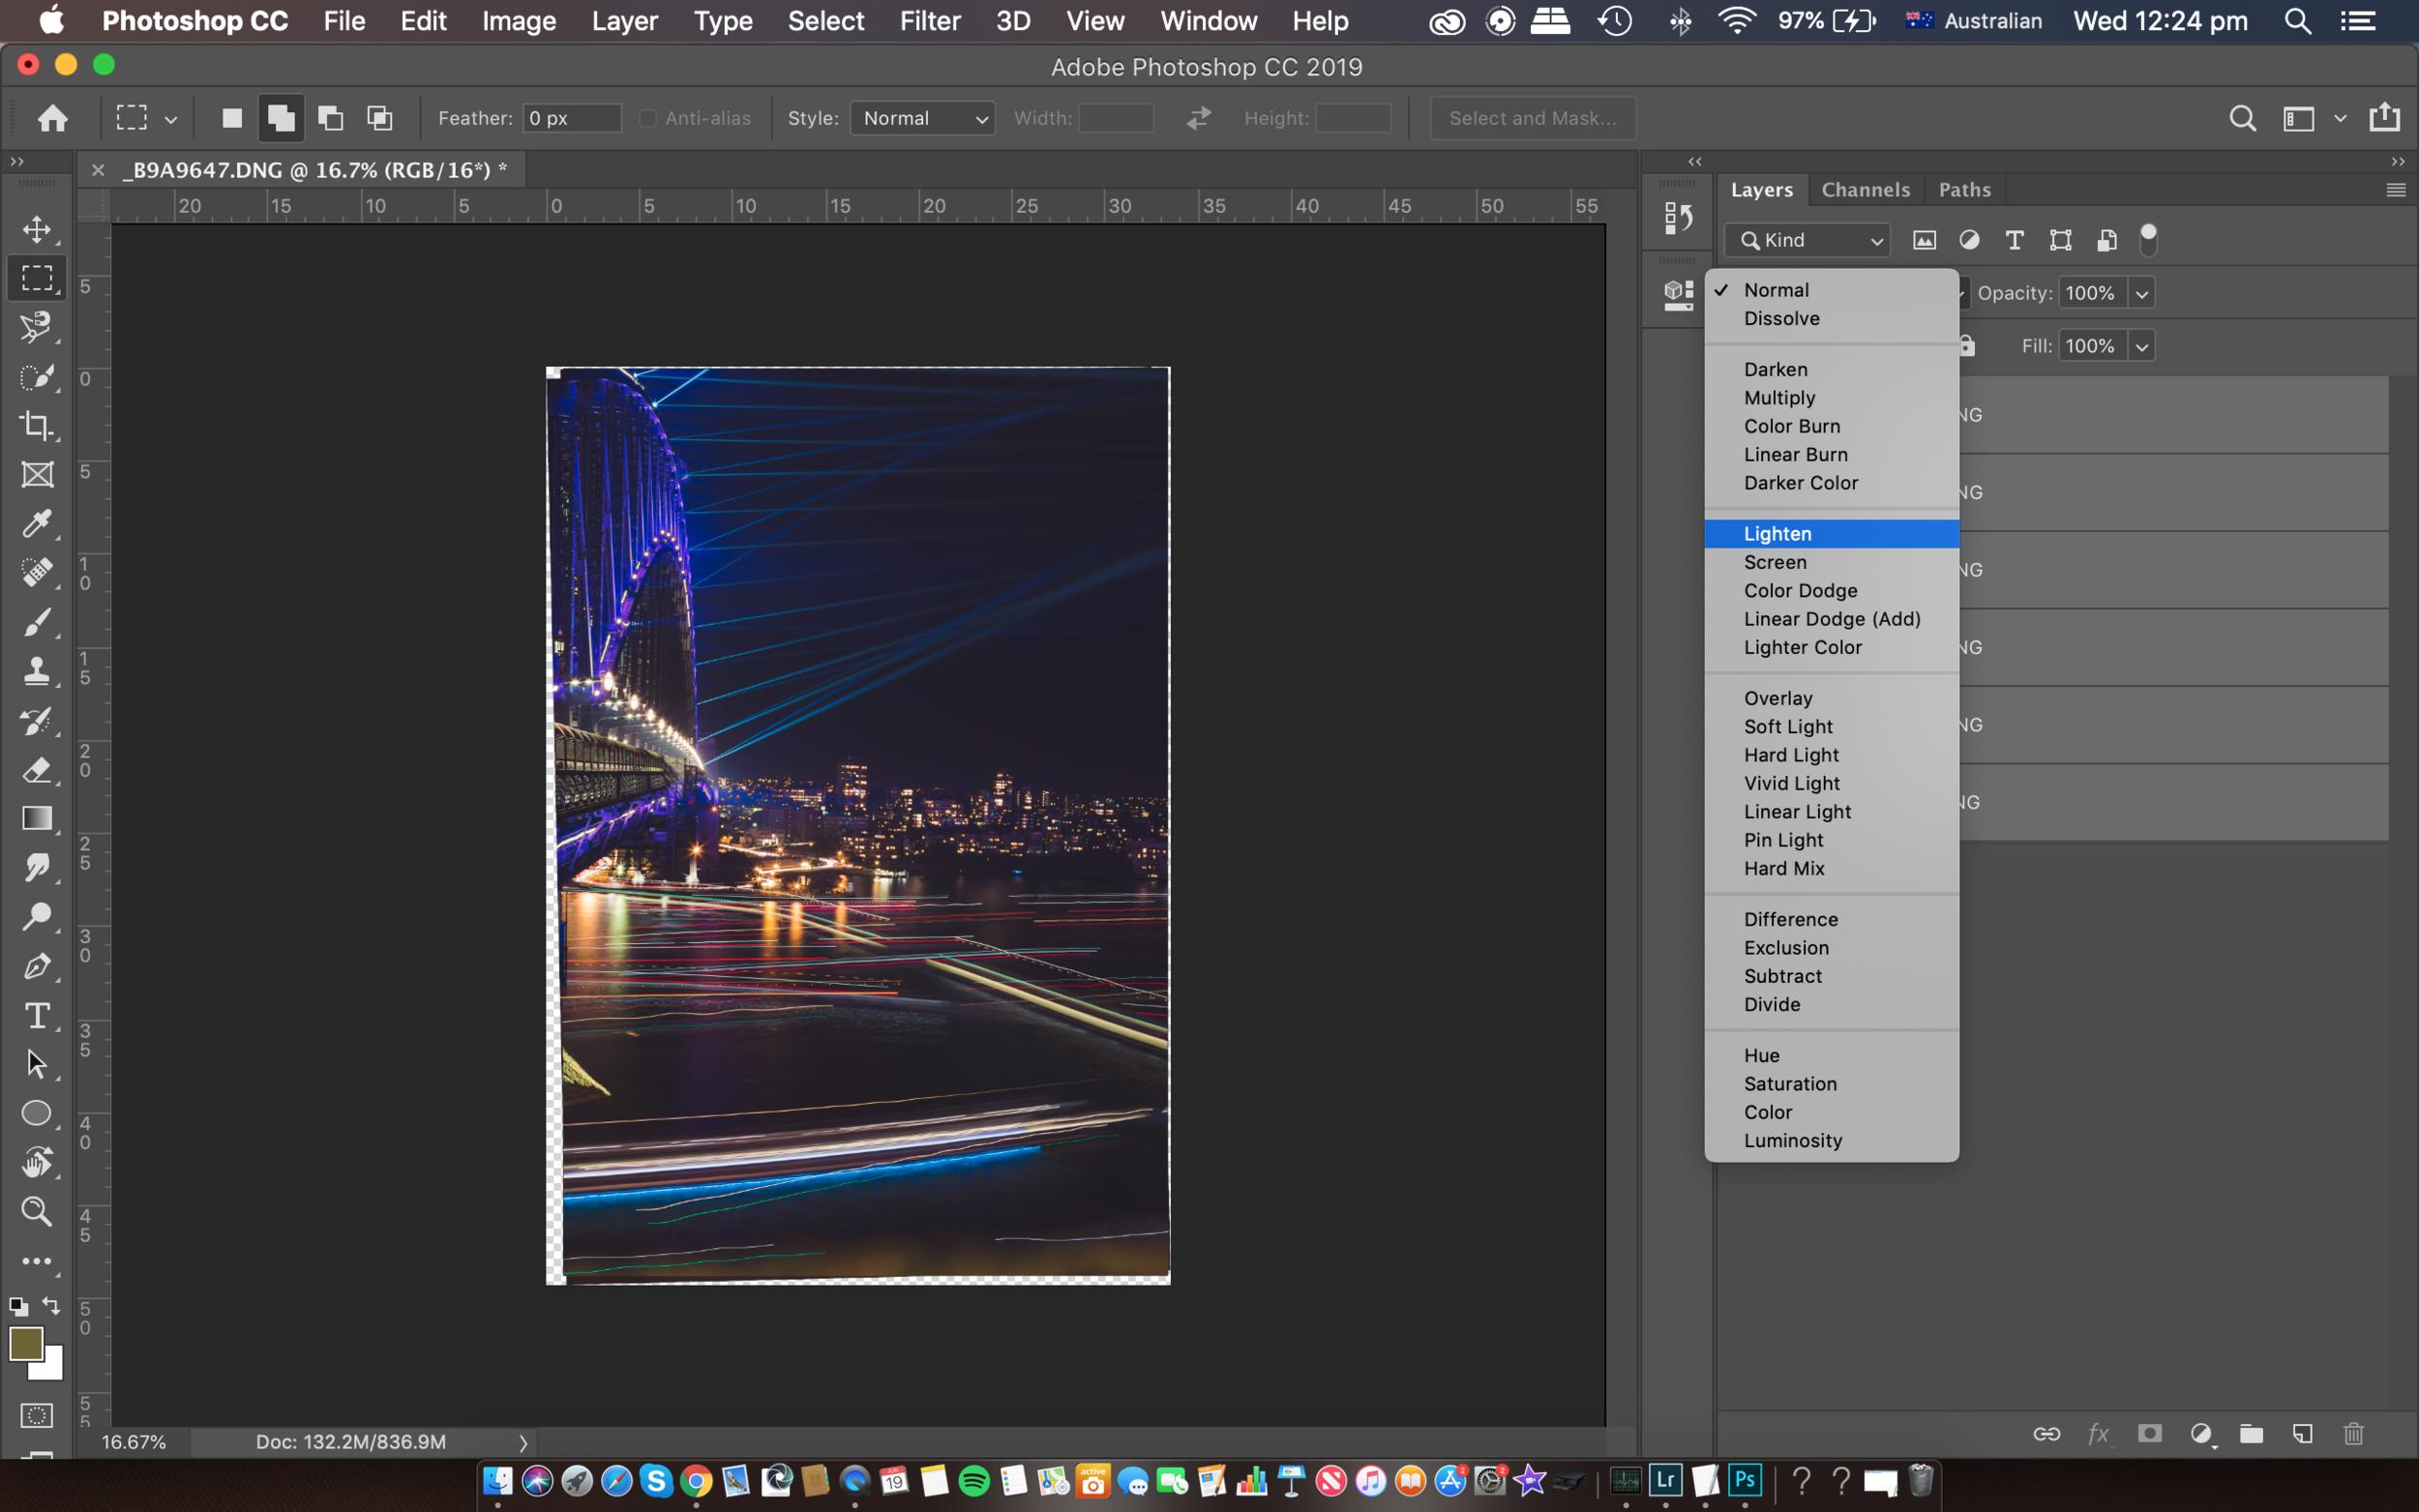 Lighten Blend Mode in Photoshop